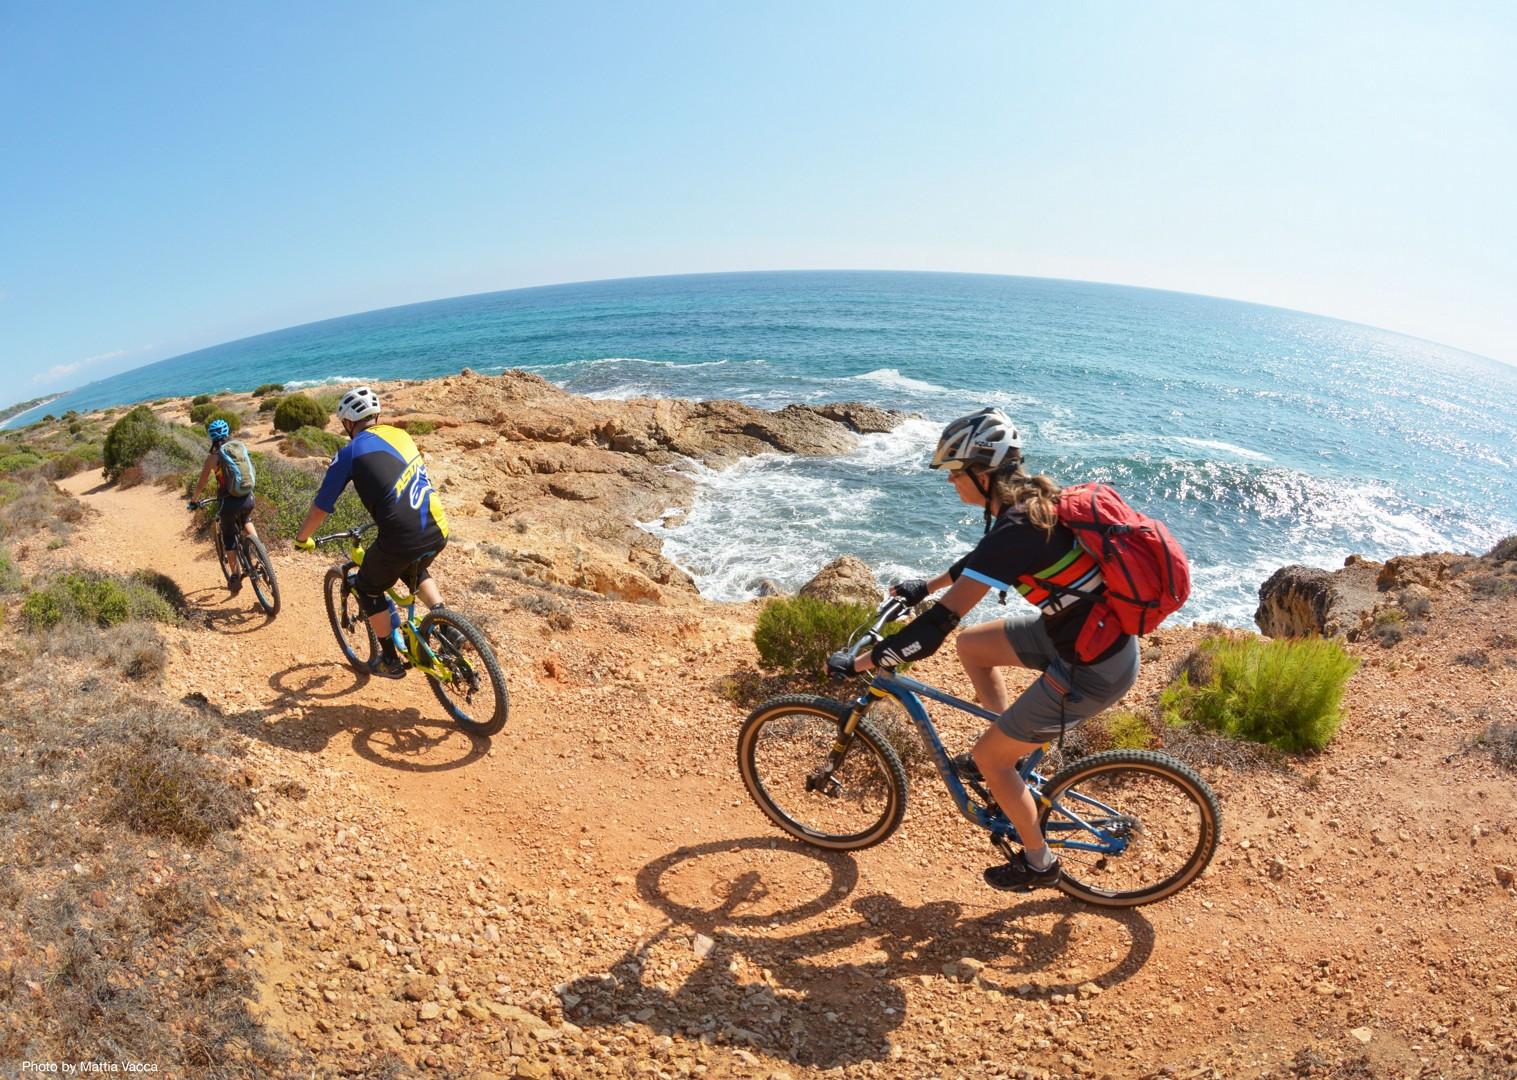 biking-enduro-in-italy-sardinia-mountain-bike-holiday.jpg - Sardinia - Sardinian Enduro - Guided Mountain Bike Holiday - Italia Mountain Biking